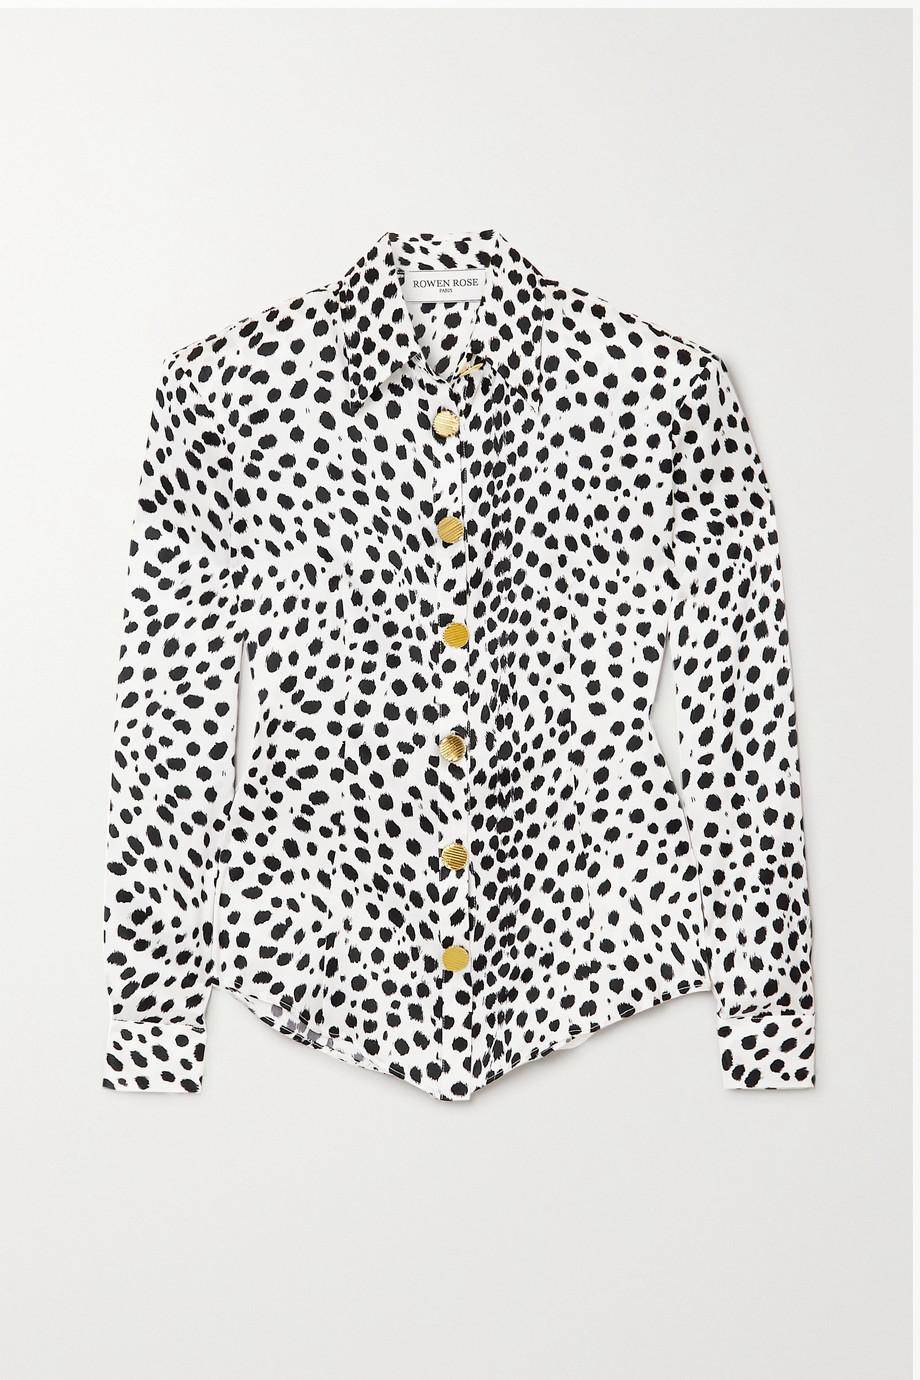 Rowen Rose Animal-print silk-satin shirt